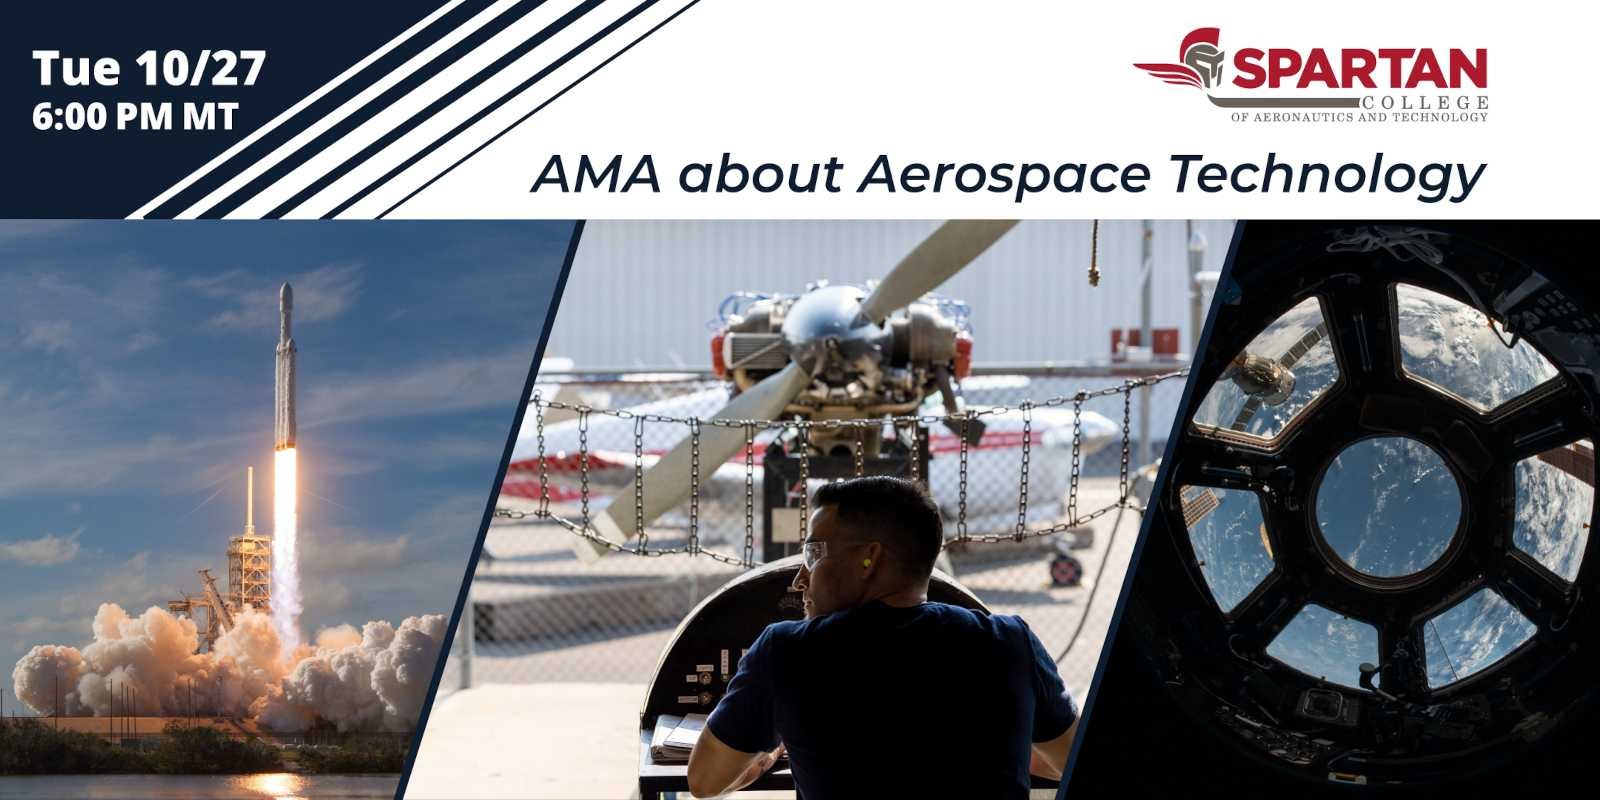 AMA About Aerospace Technology event